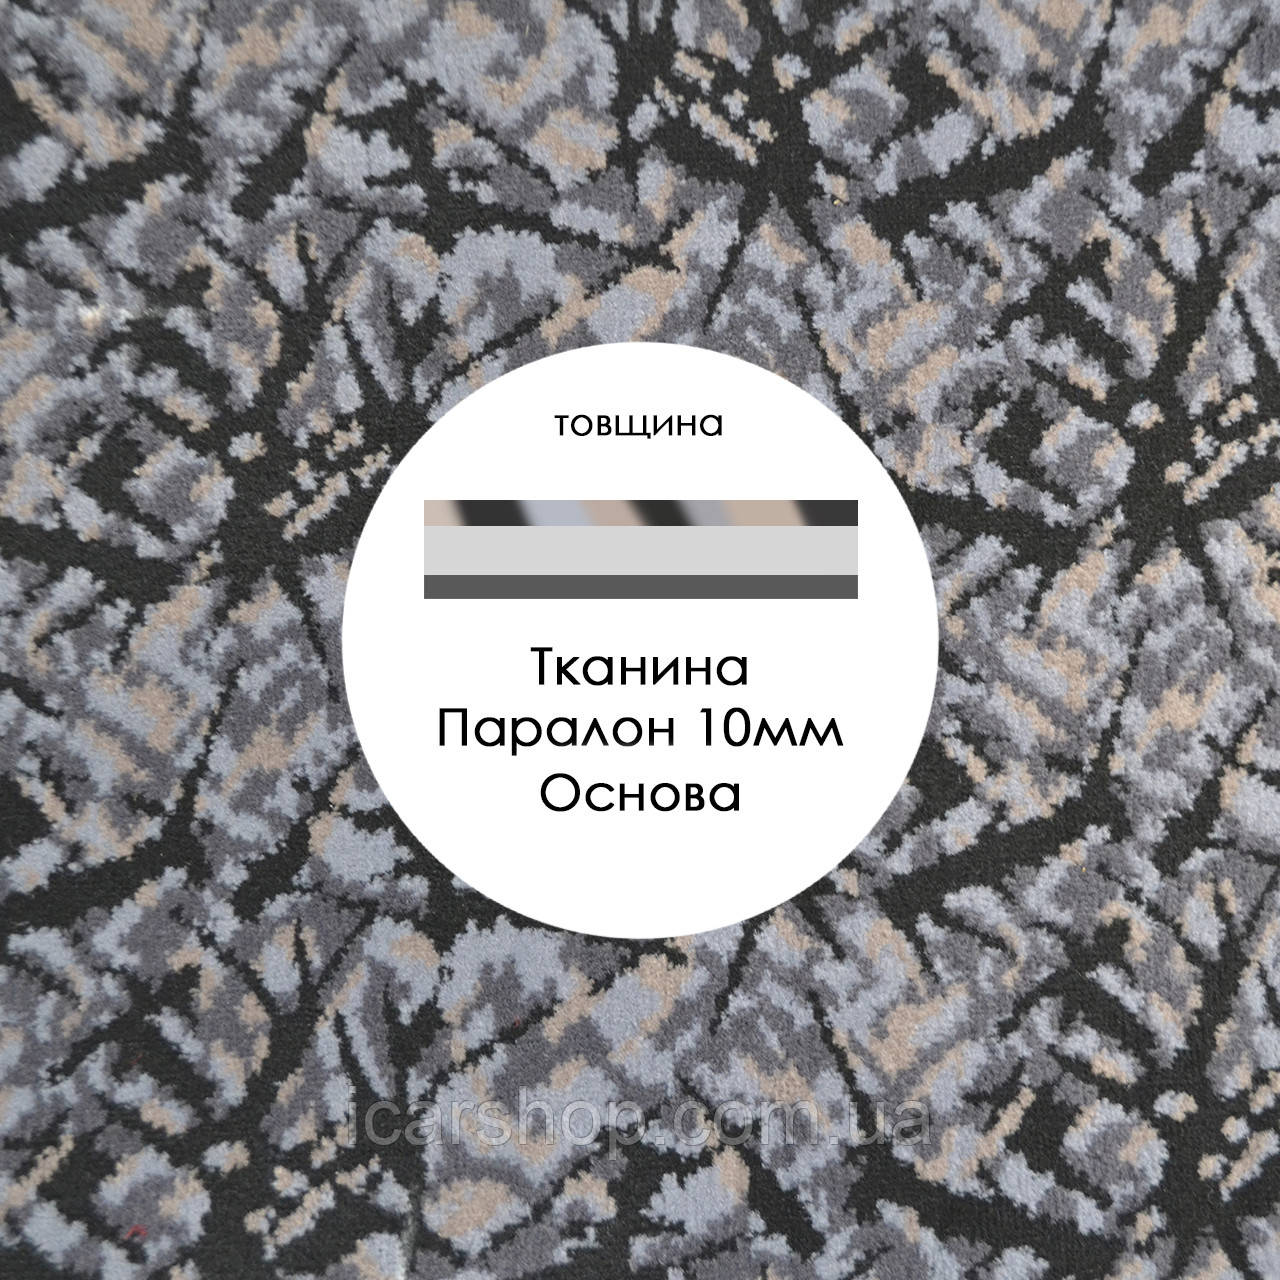 Ткань 285 Серый (1.5м) / На поролоне 10мм и ткань